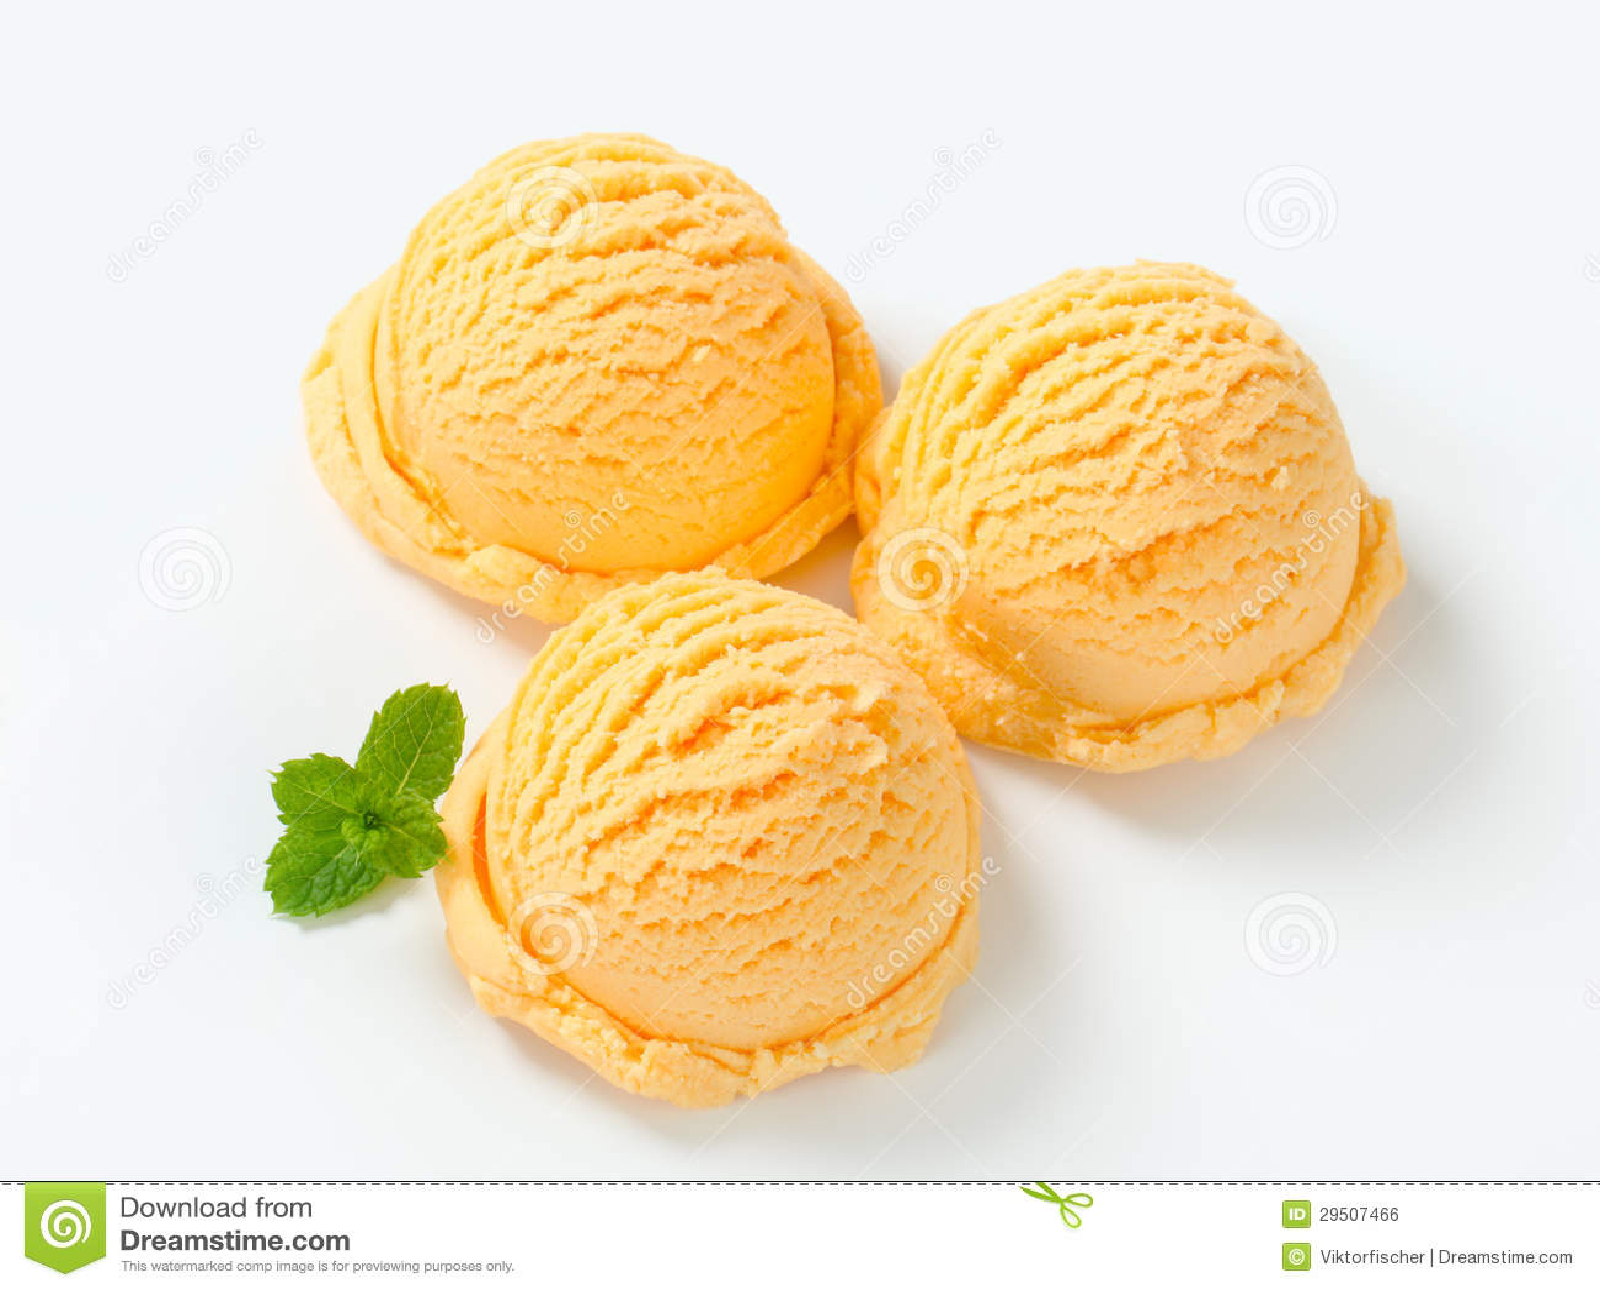 ... apricot jam apricot biscotti apricot miso jam apricot zabaglione ice